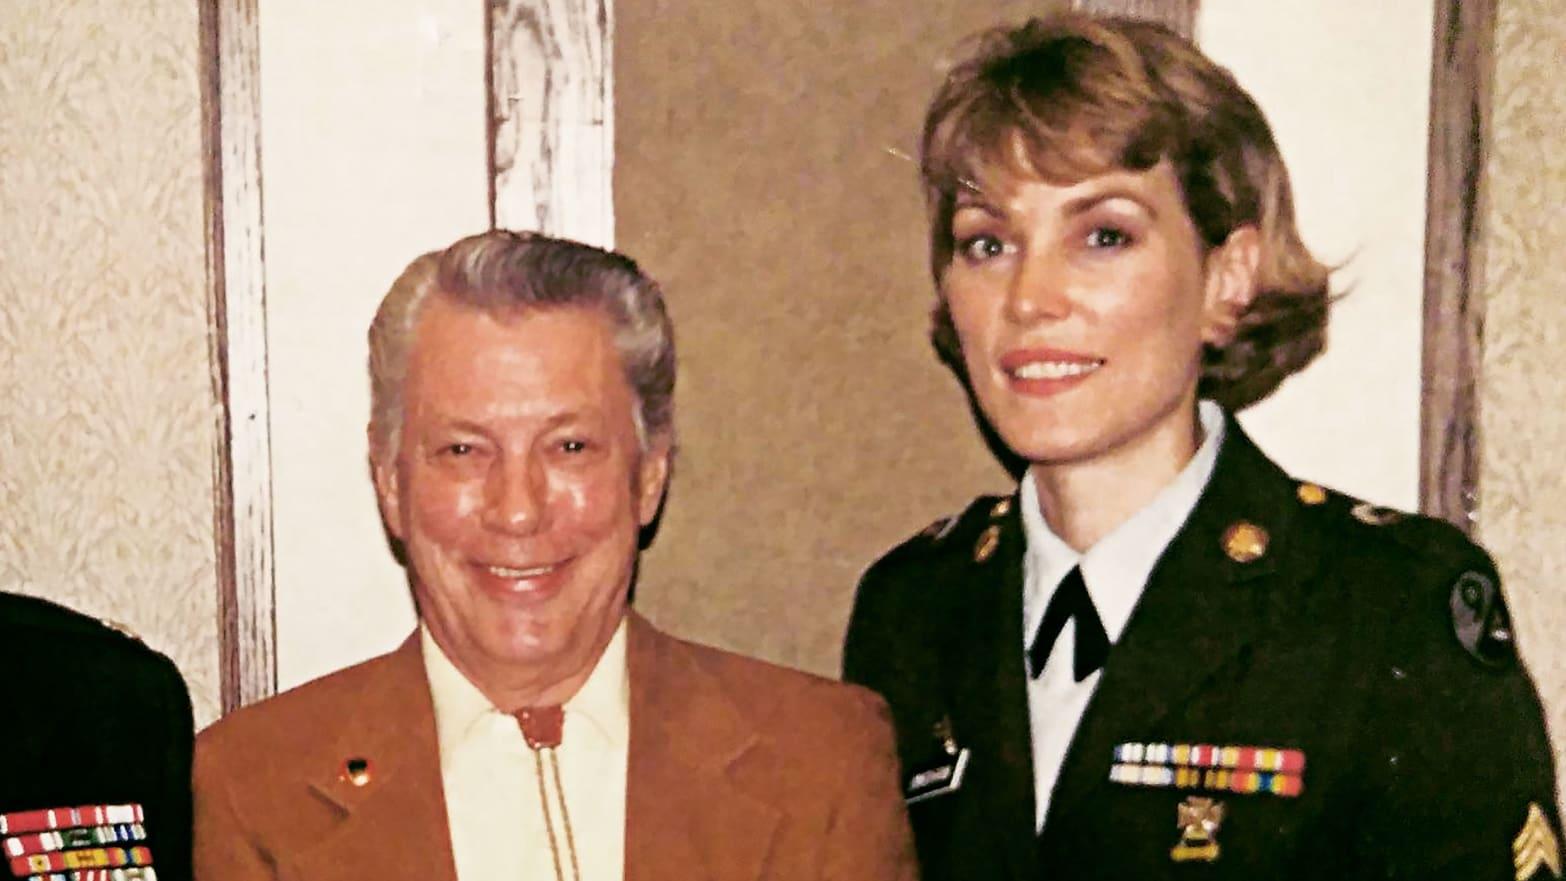 Wayne Johnny Johnson and Sgt V Bingham Schraumburg IL, 1996.